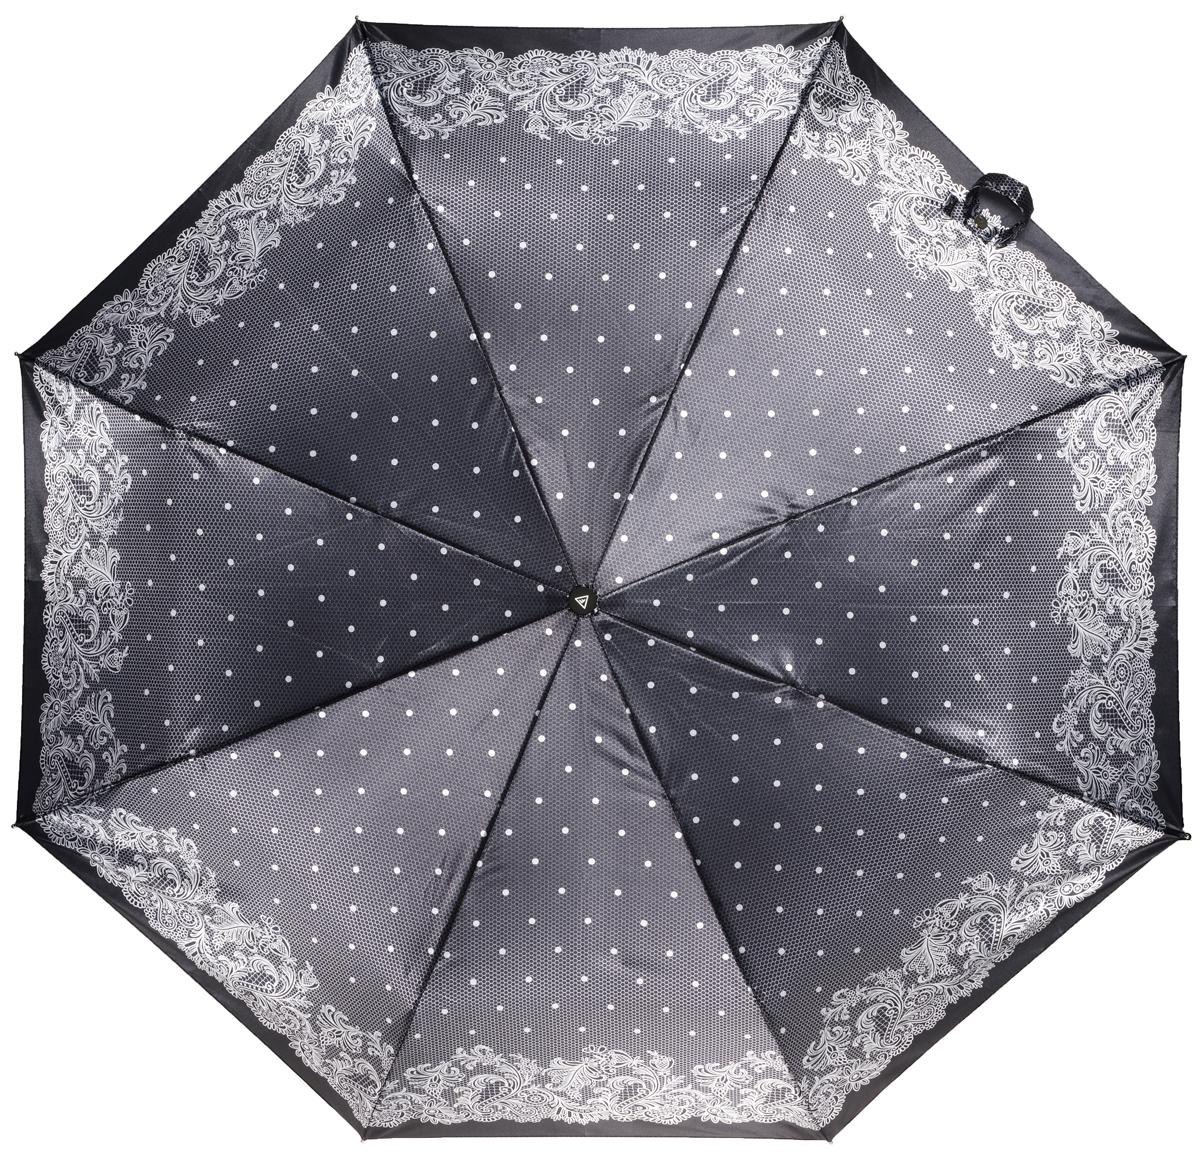 Зонт женский Fabretti, автомат, 3 сложения, цвет: серый. L-16106-16L-16106-16Зонт женский Fabretti, облегченный суперавтомат, 3 сложения